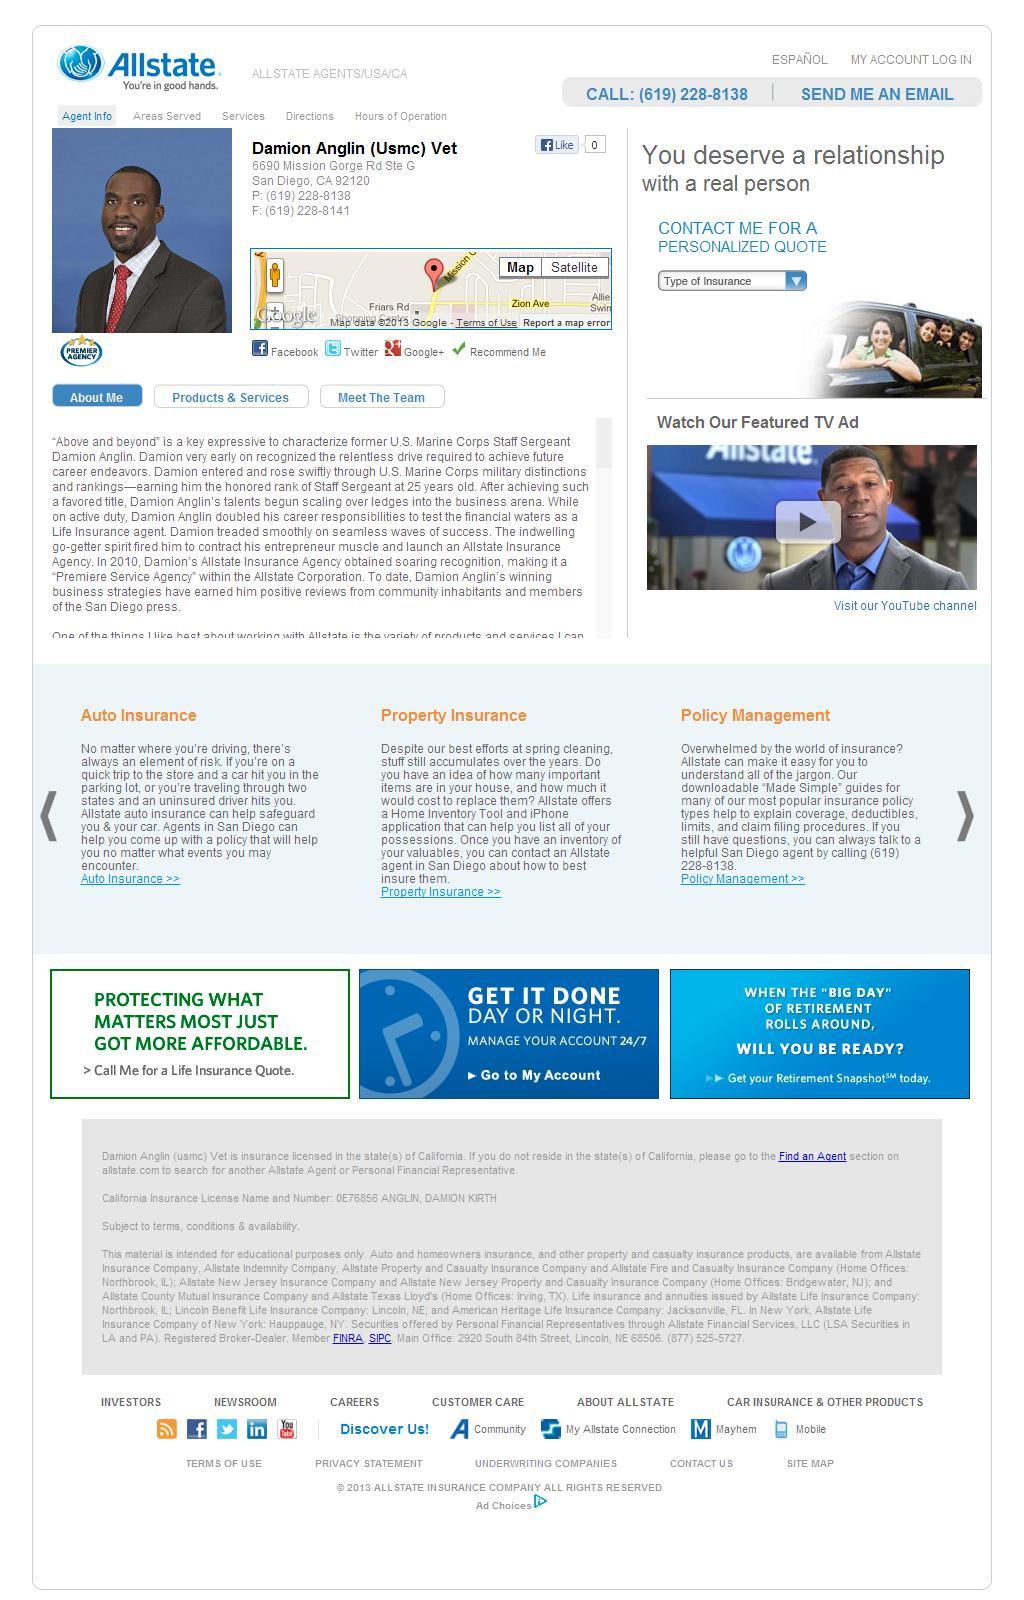 allstate insurance company case study